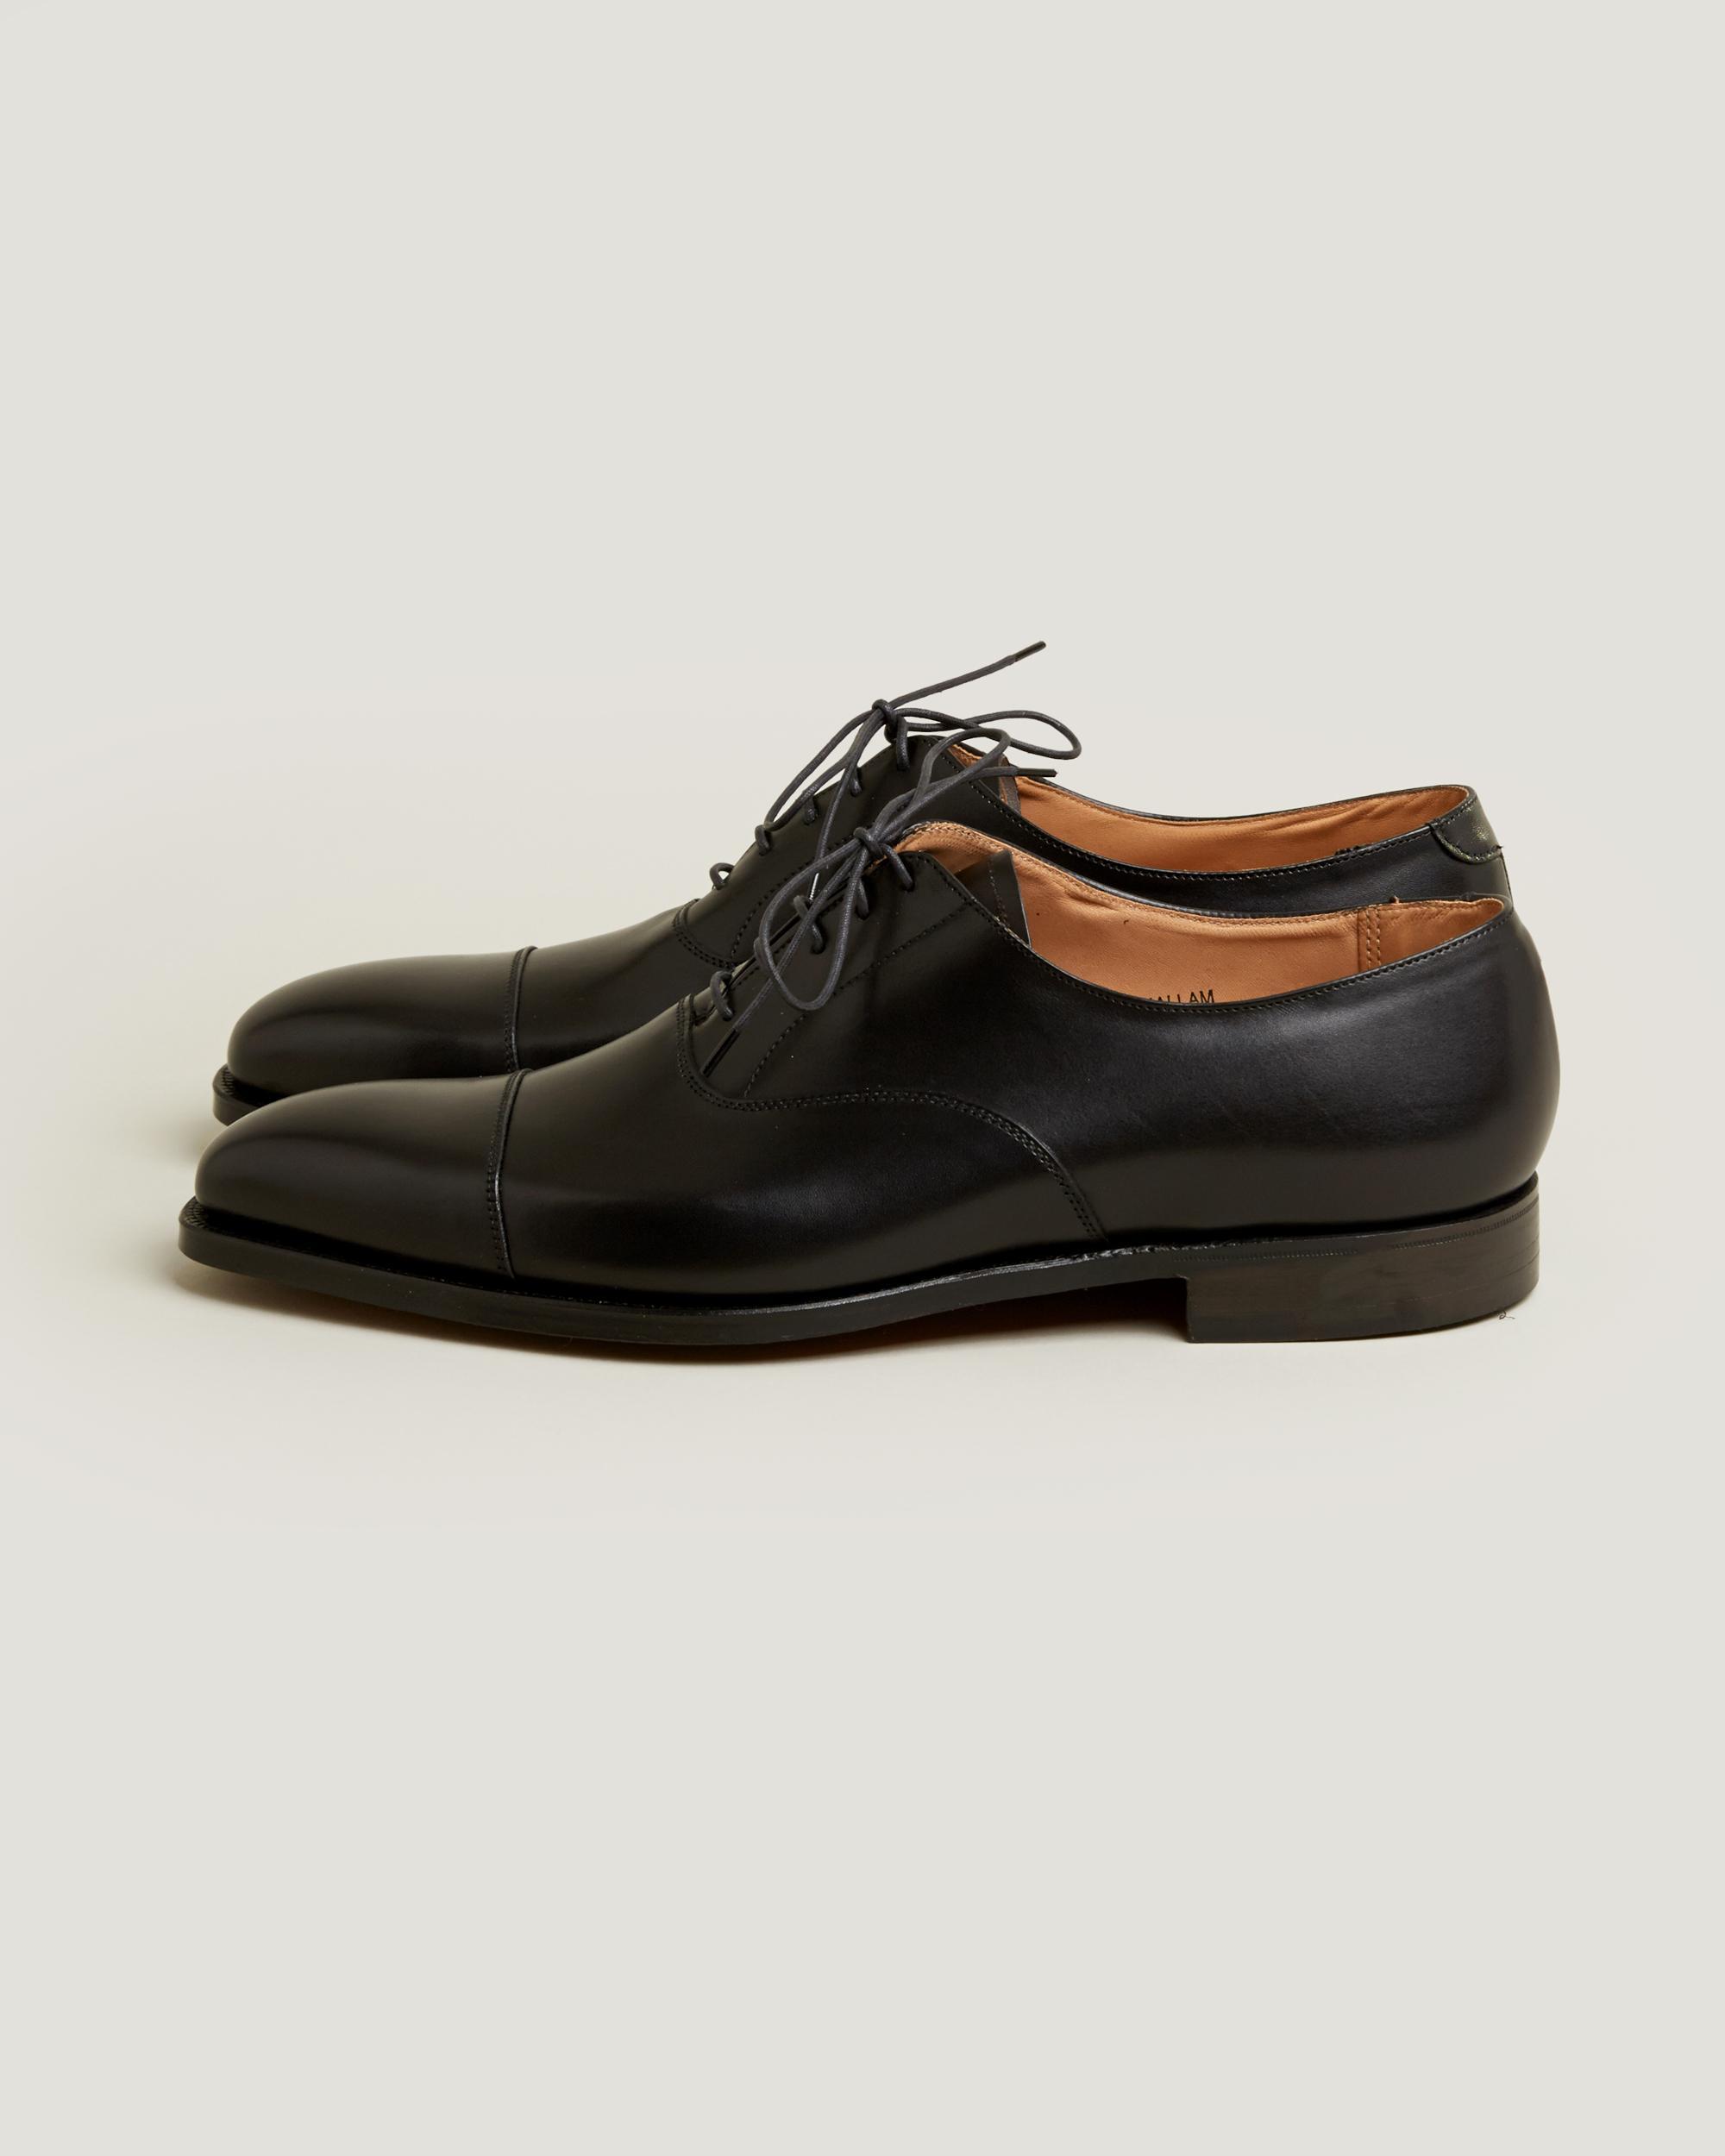 Hallam Calf Leather Oxford Shoes Dark Black Crockett & Jones GxGdUUSNf